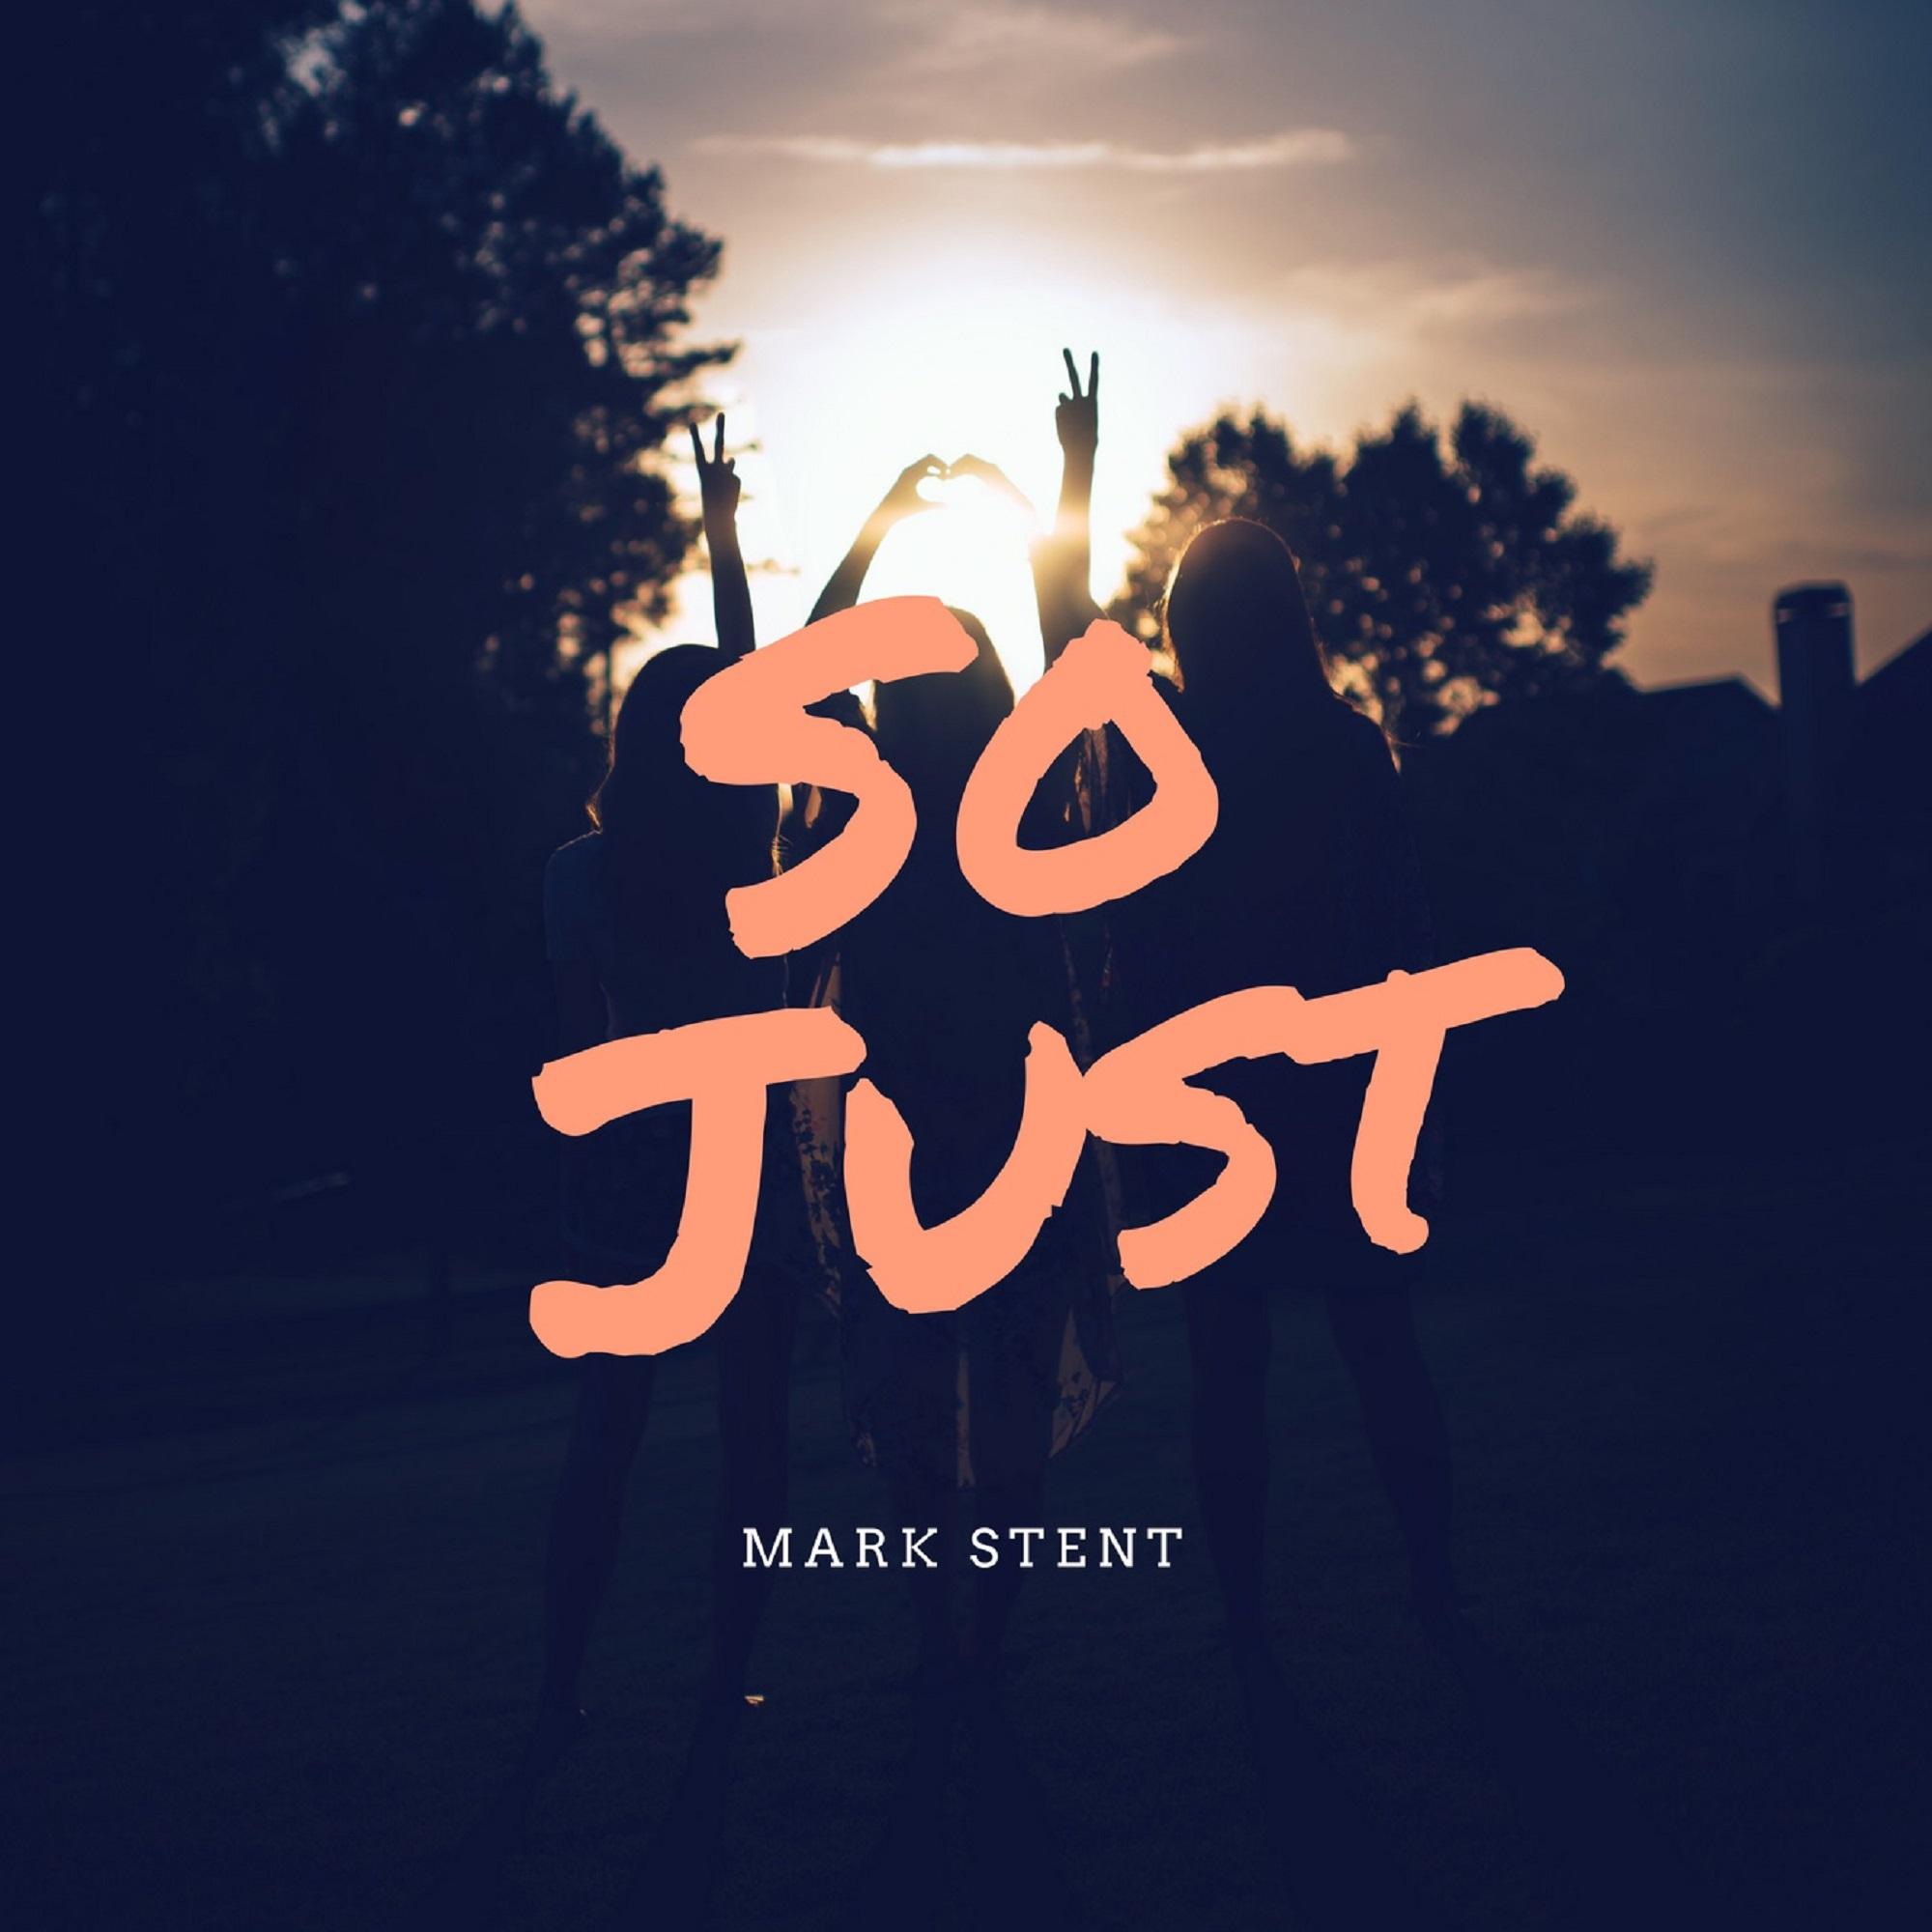 MARK STENT